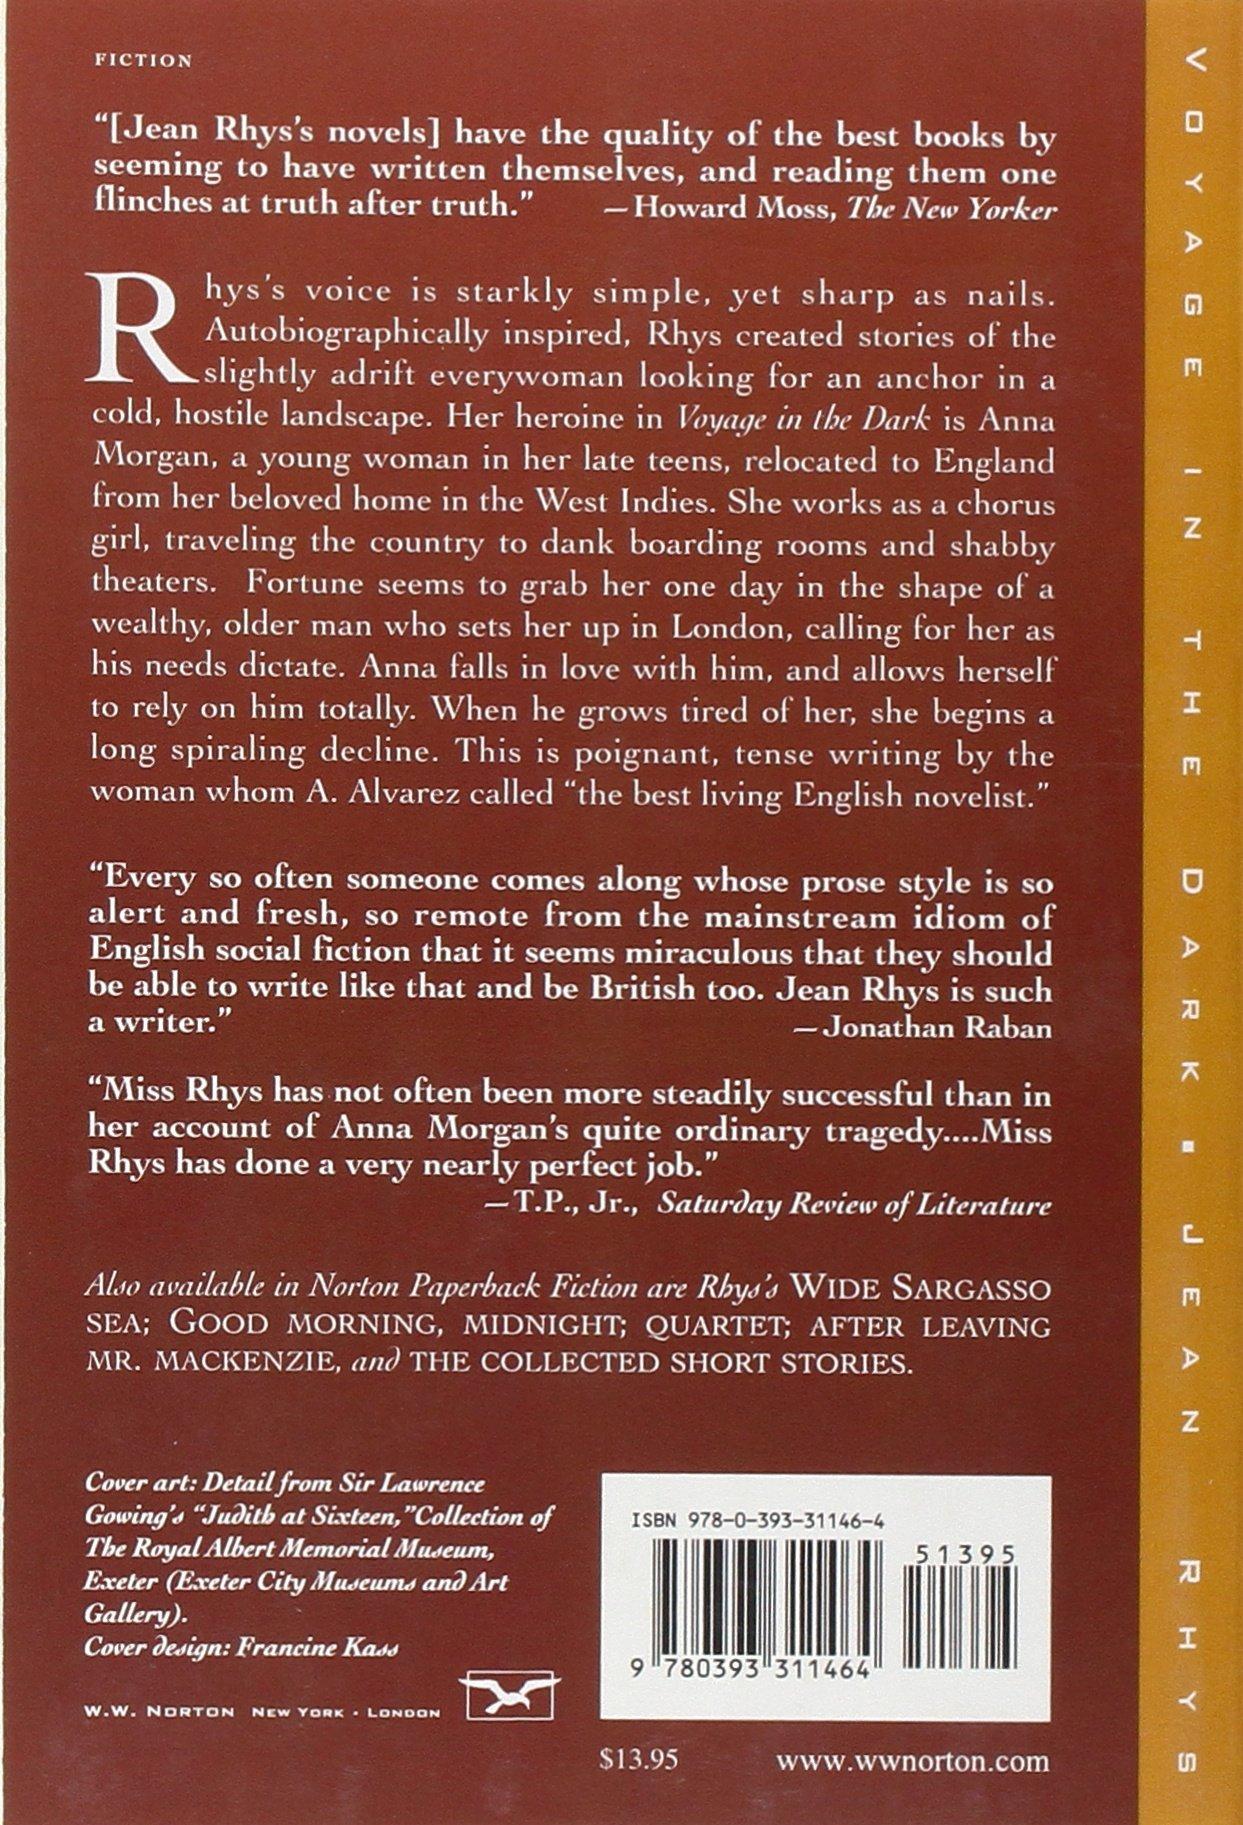 voyage in the dark norton paperback fiction jean rhys voyage in the dark norton paperback fiction jean rhys 9780393311464 com books